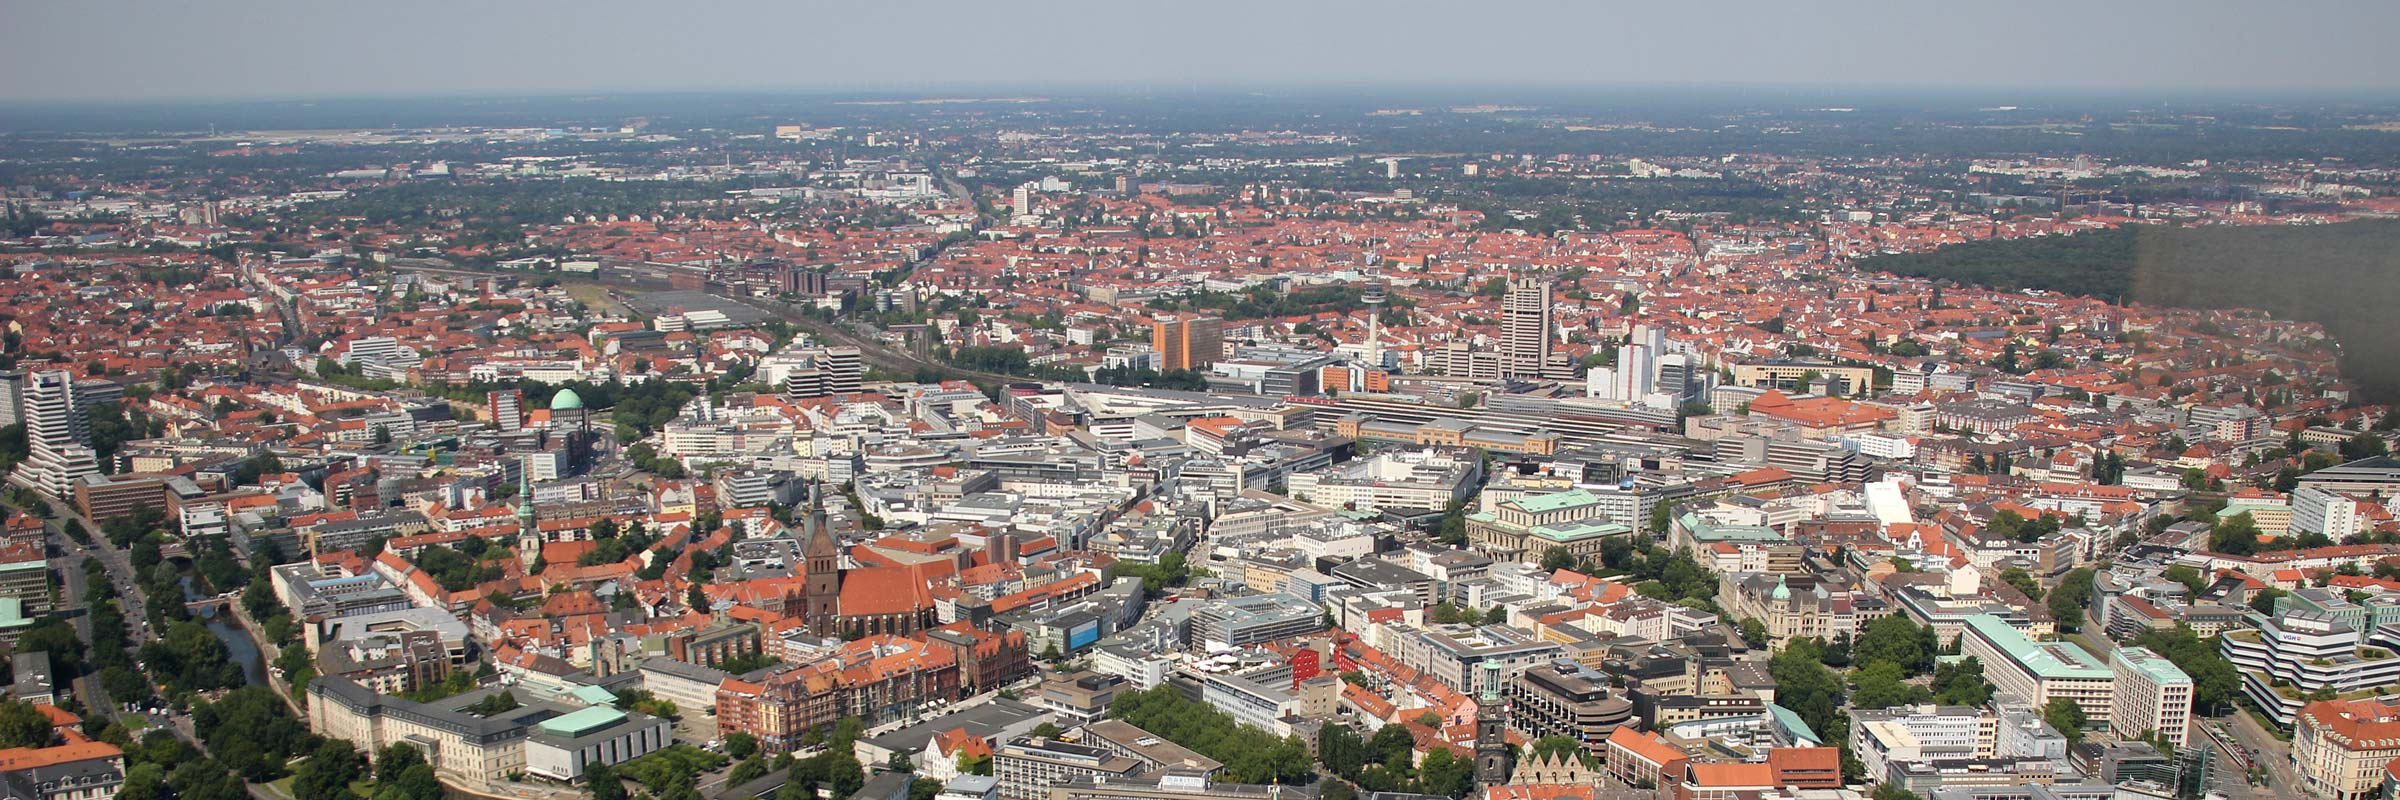 Flyer verteilen lassen in Hannover